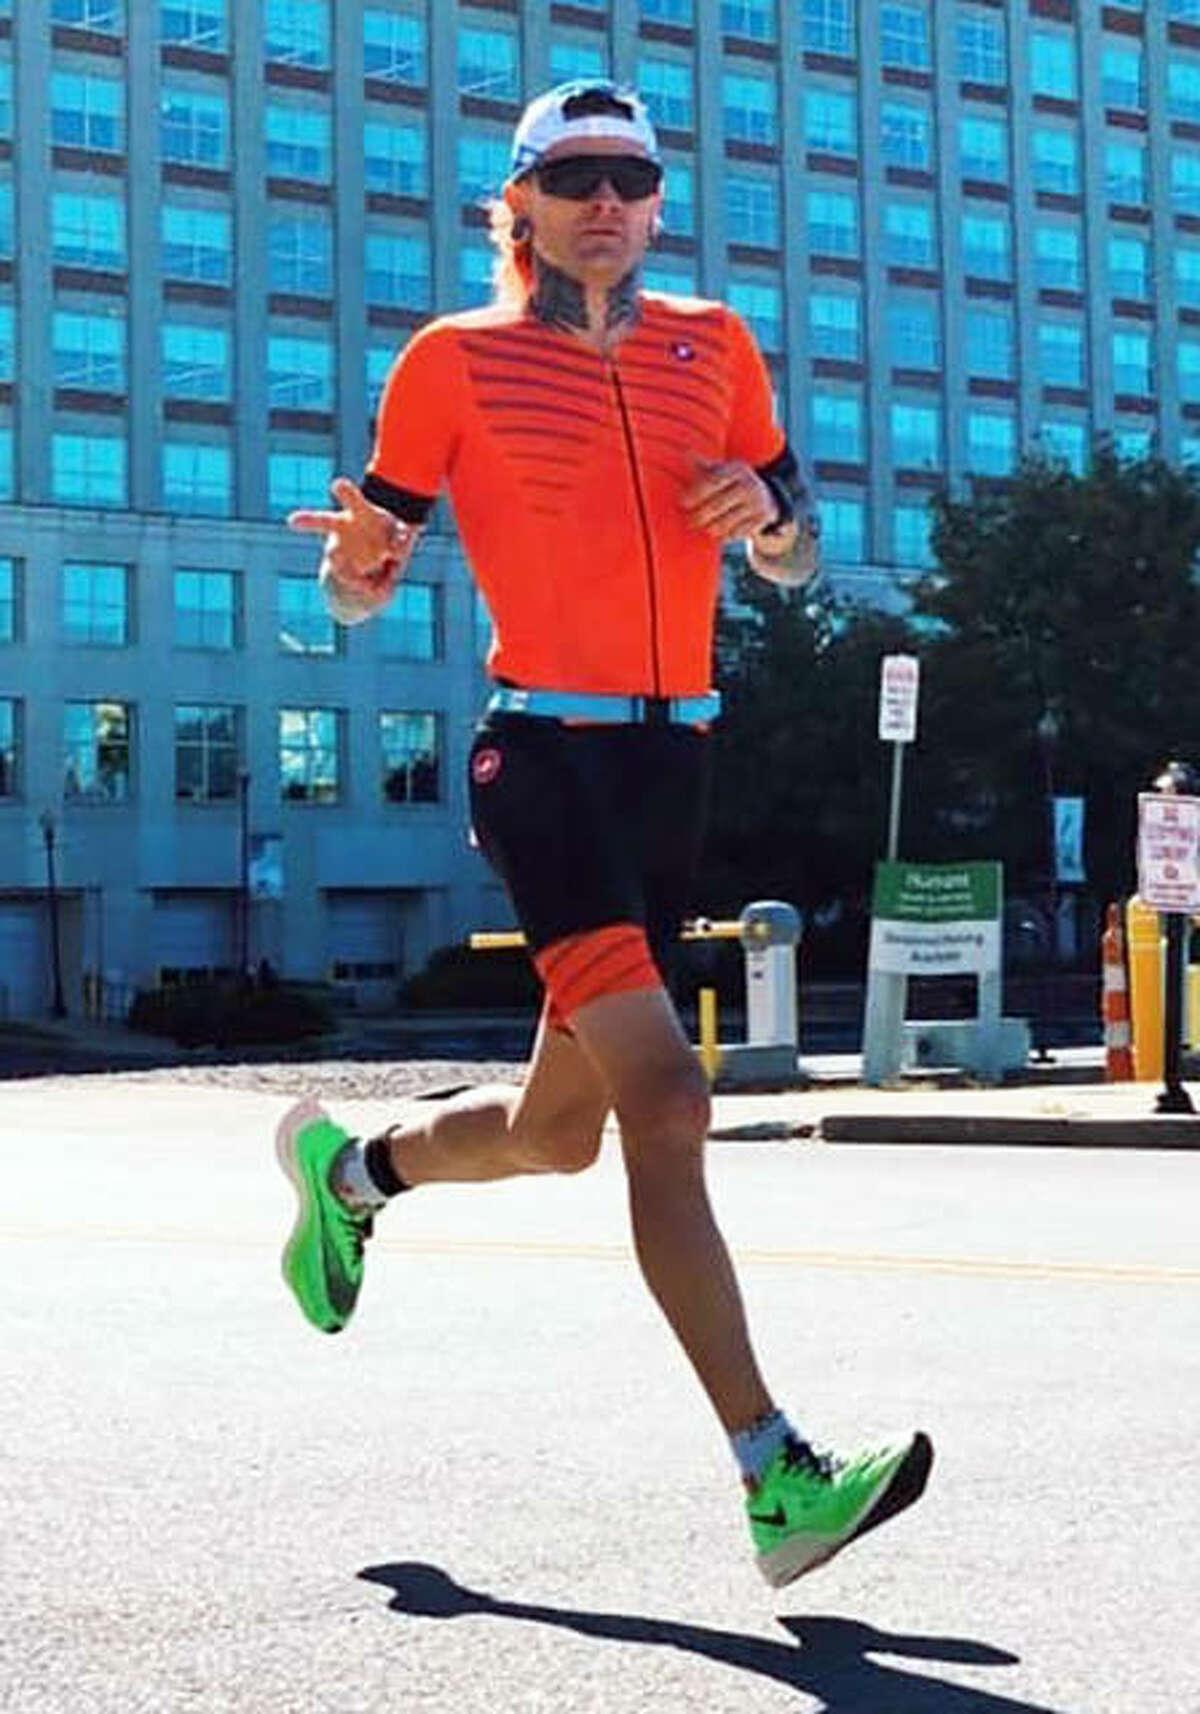 Edwardsville graduate Dane Shaw at the start of the marathon at Ironman Louisville 2019.